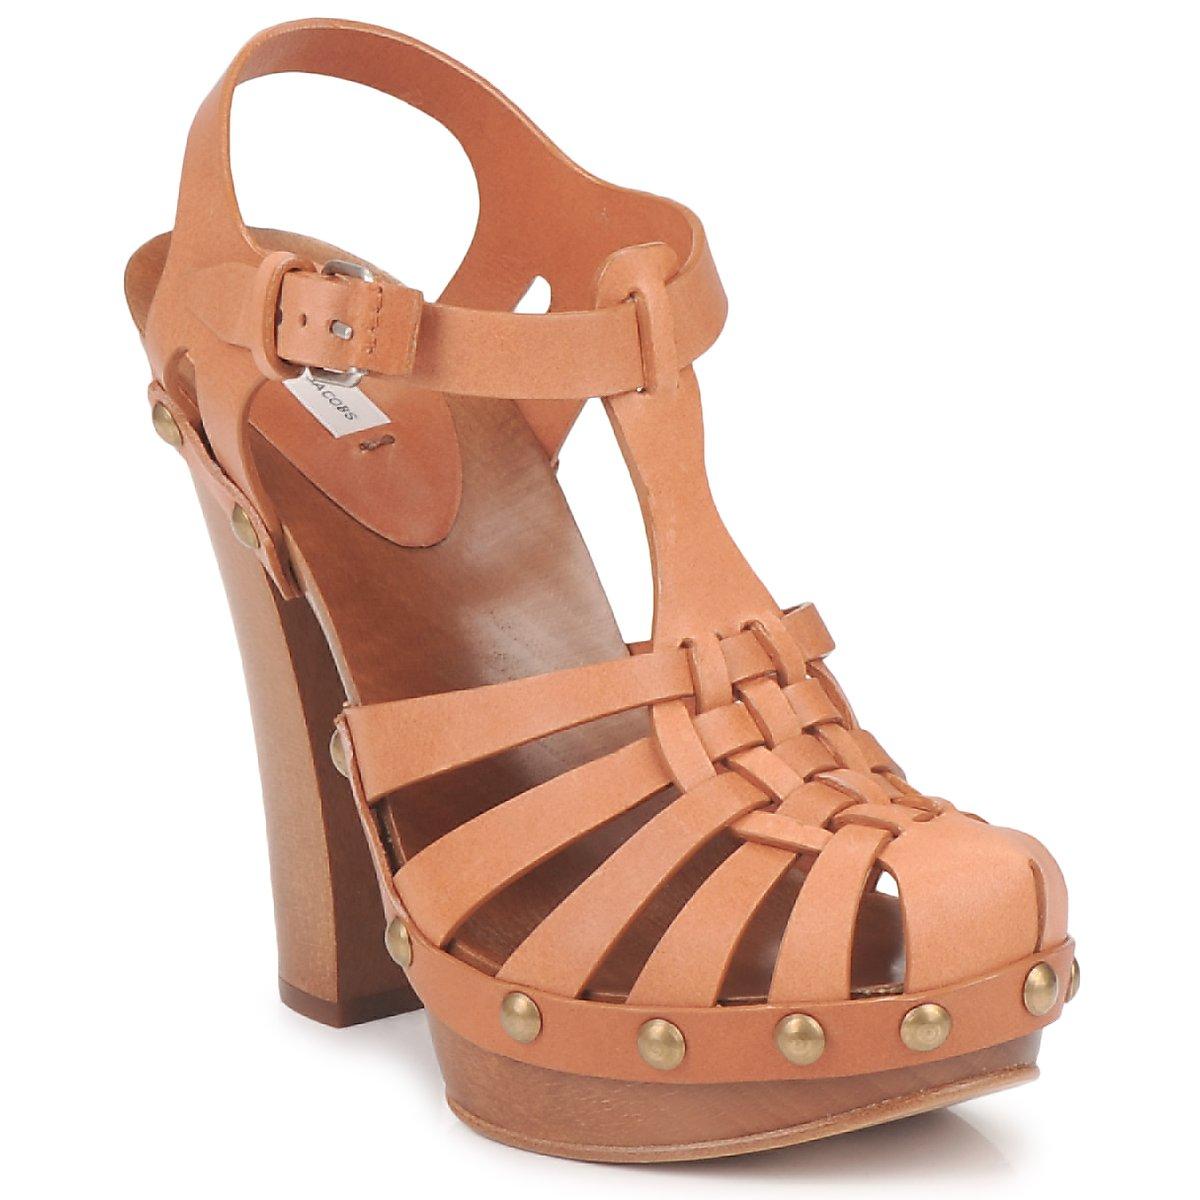 Sandale Marc Jacobs MJ18051 Beige